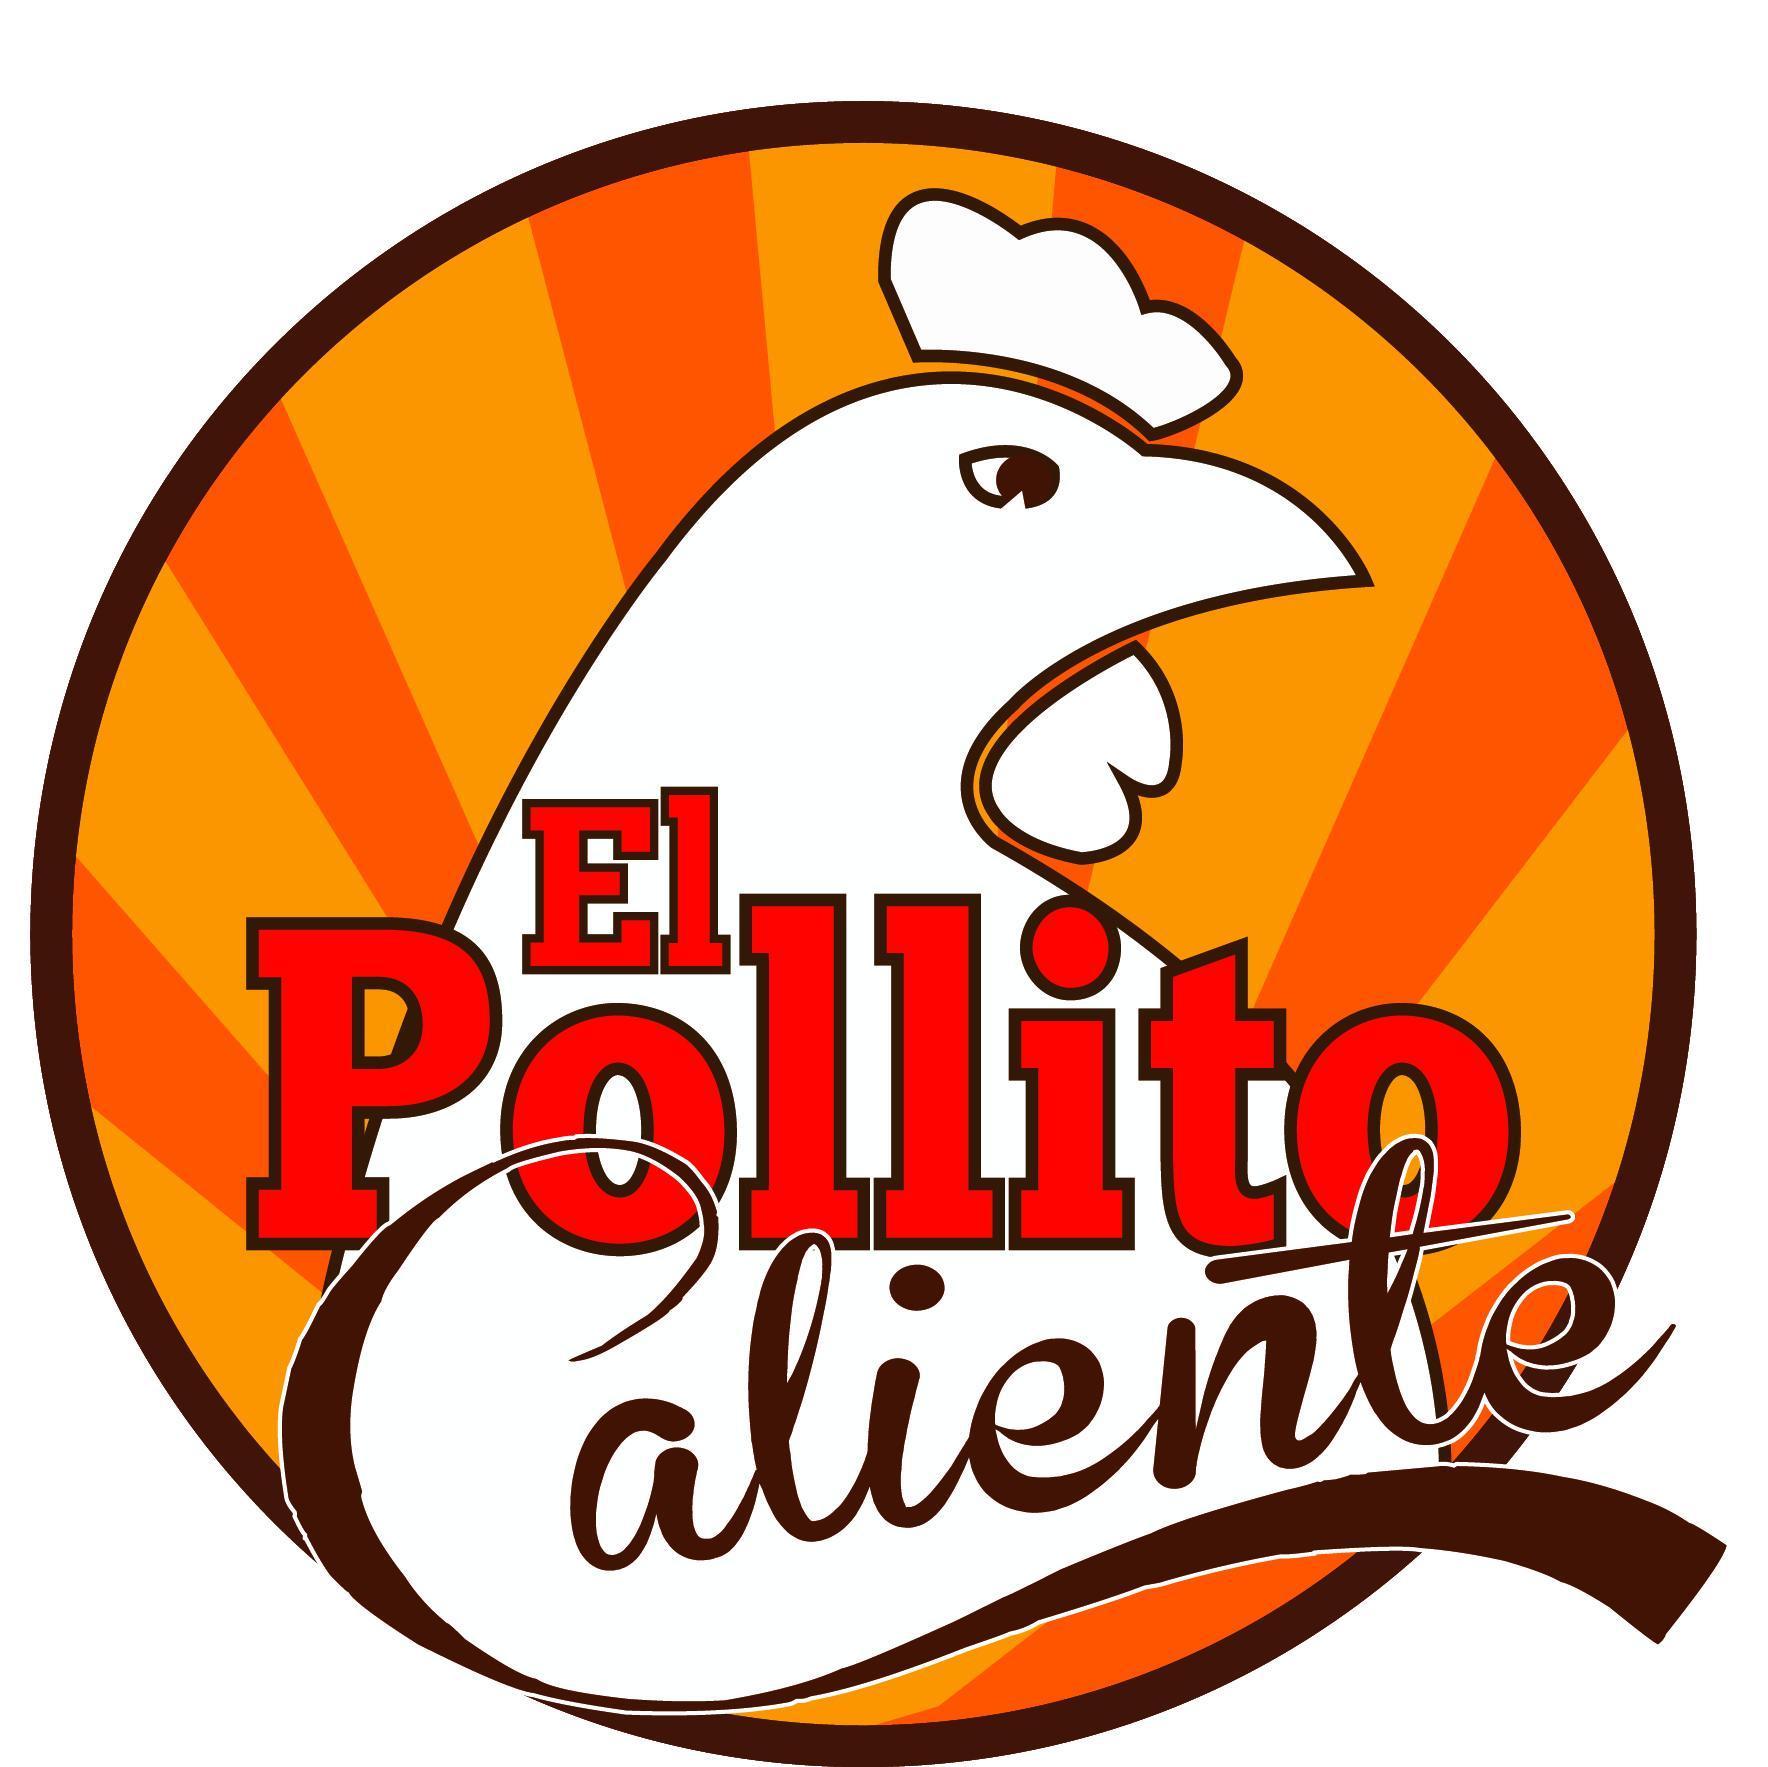 El Pollito Caliente (@elpollitopty) | Twitter